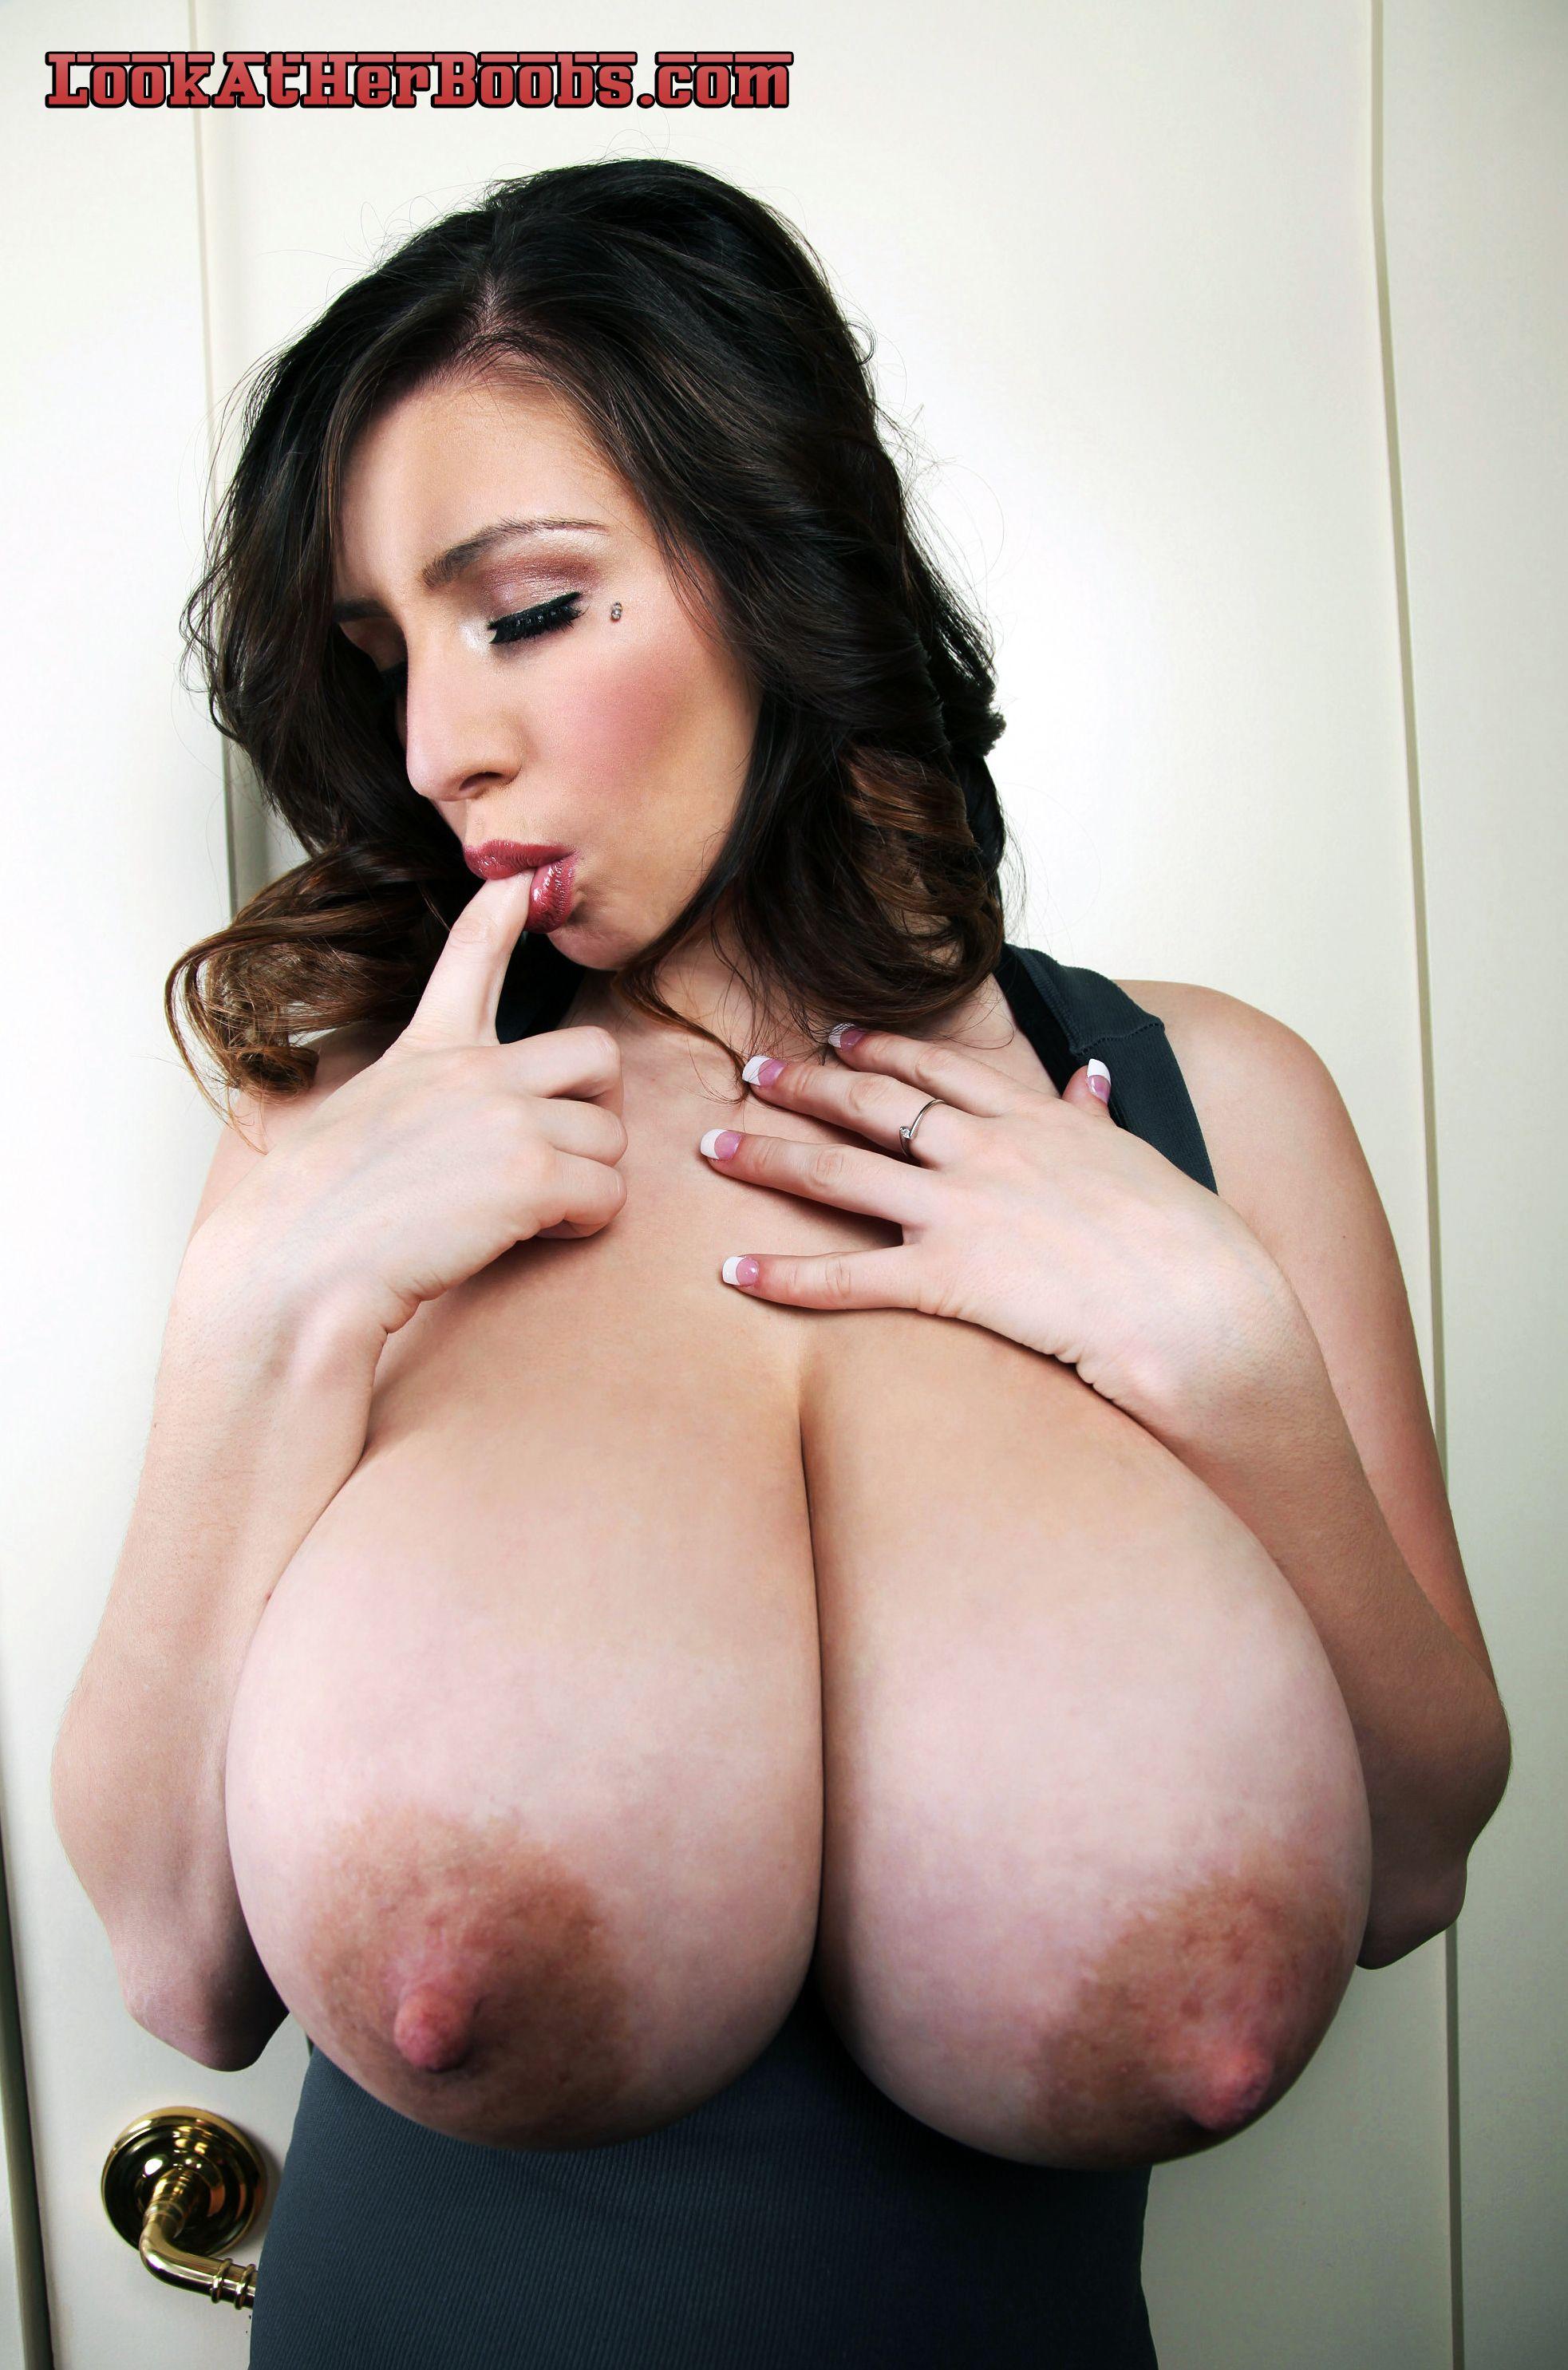 Plz Squeezing huge boobs need